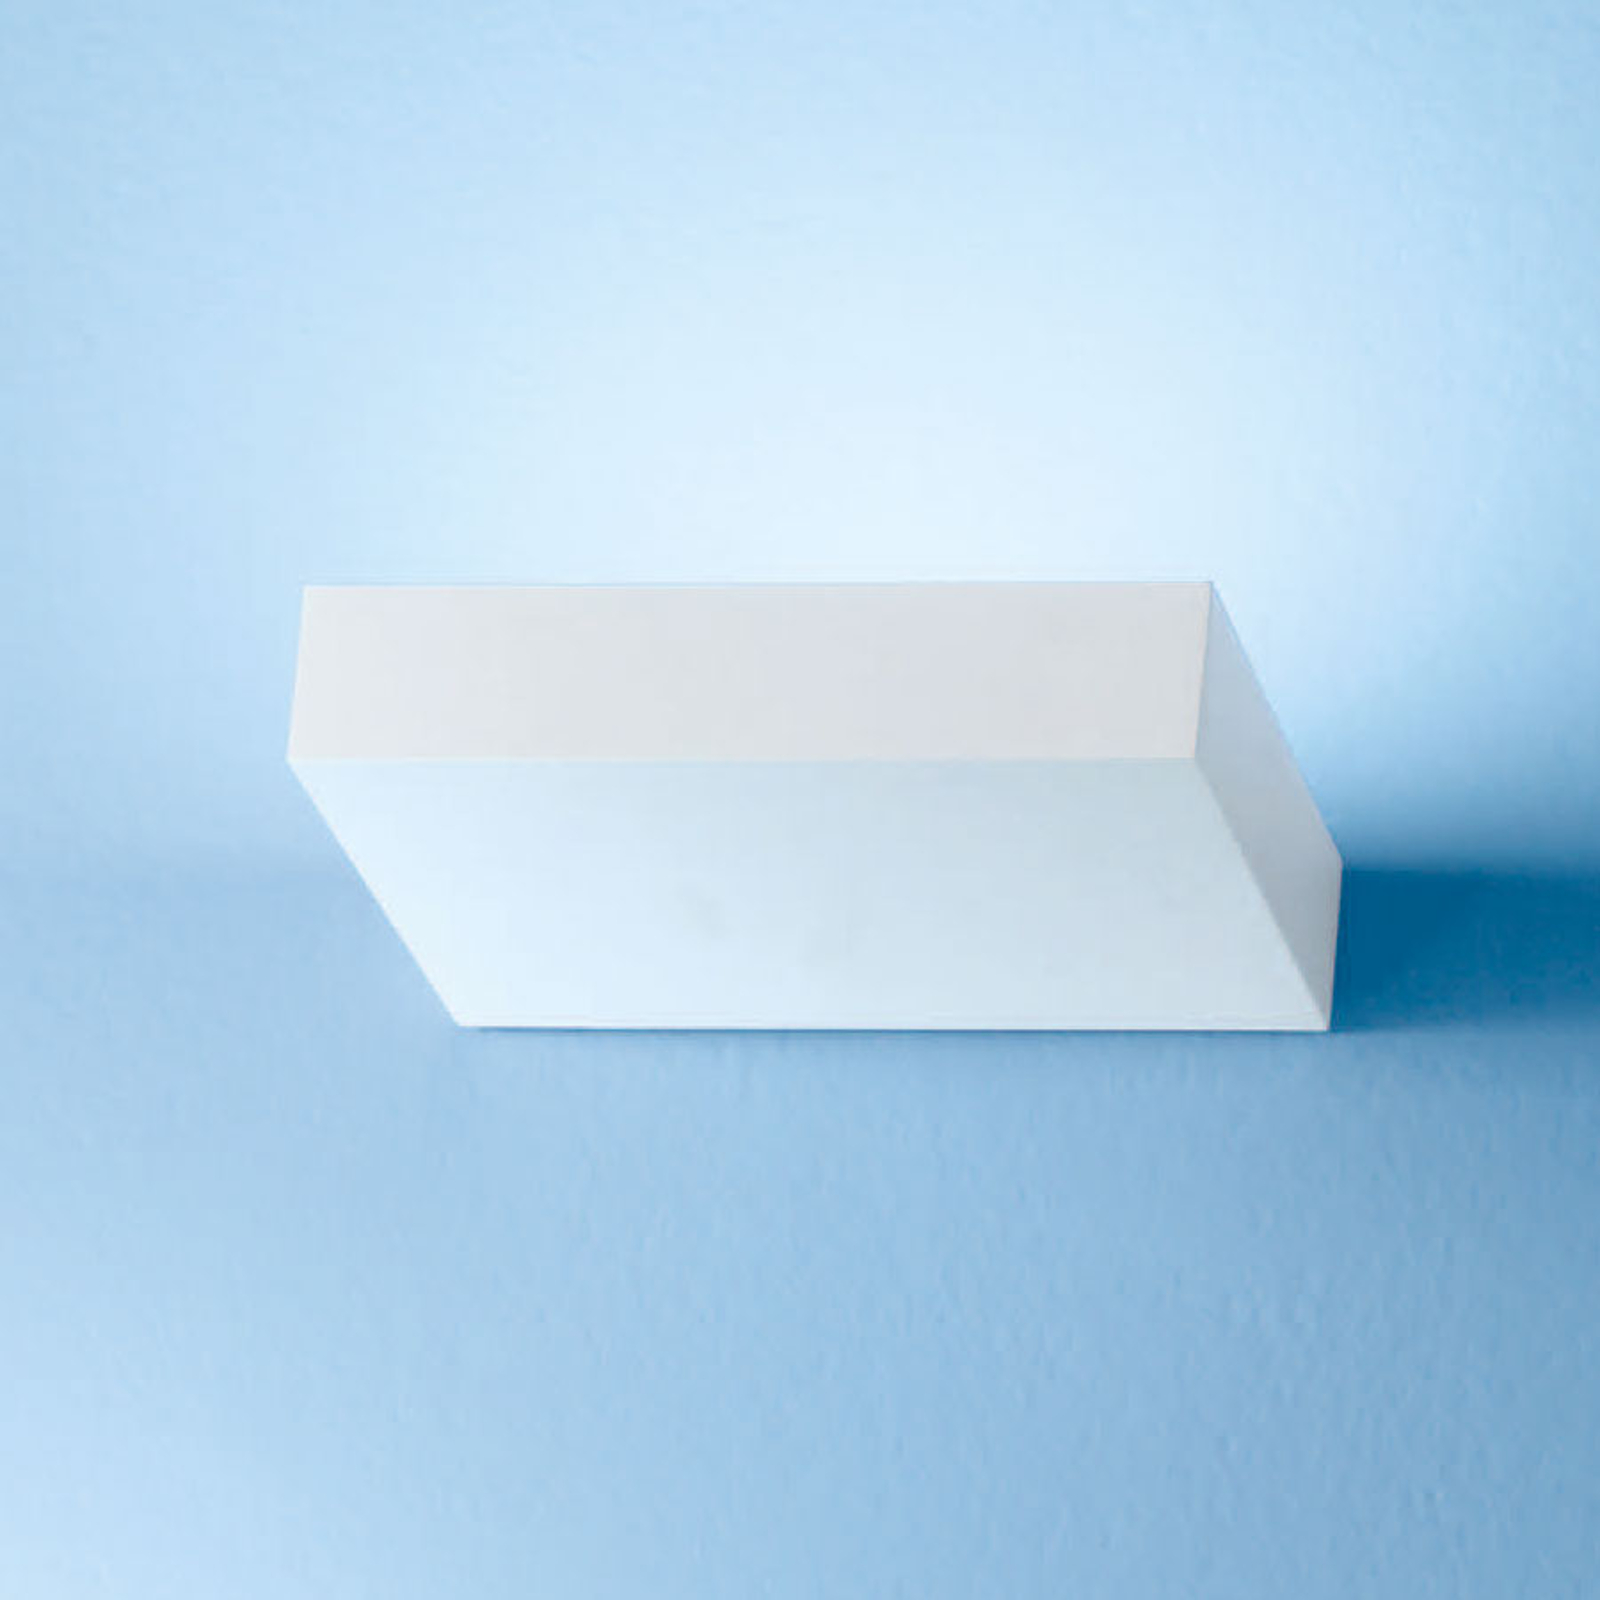 LED-Wandleuchte Regolo, Länge 16,3 cm, weiß